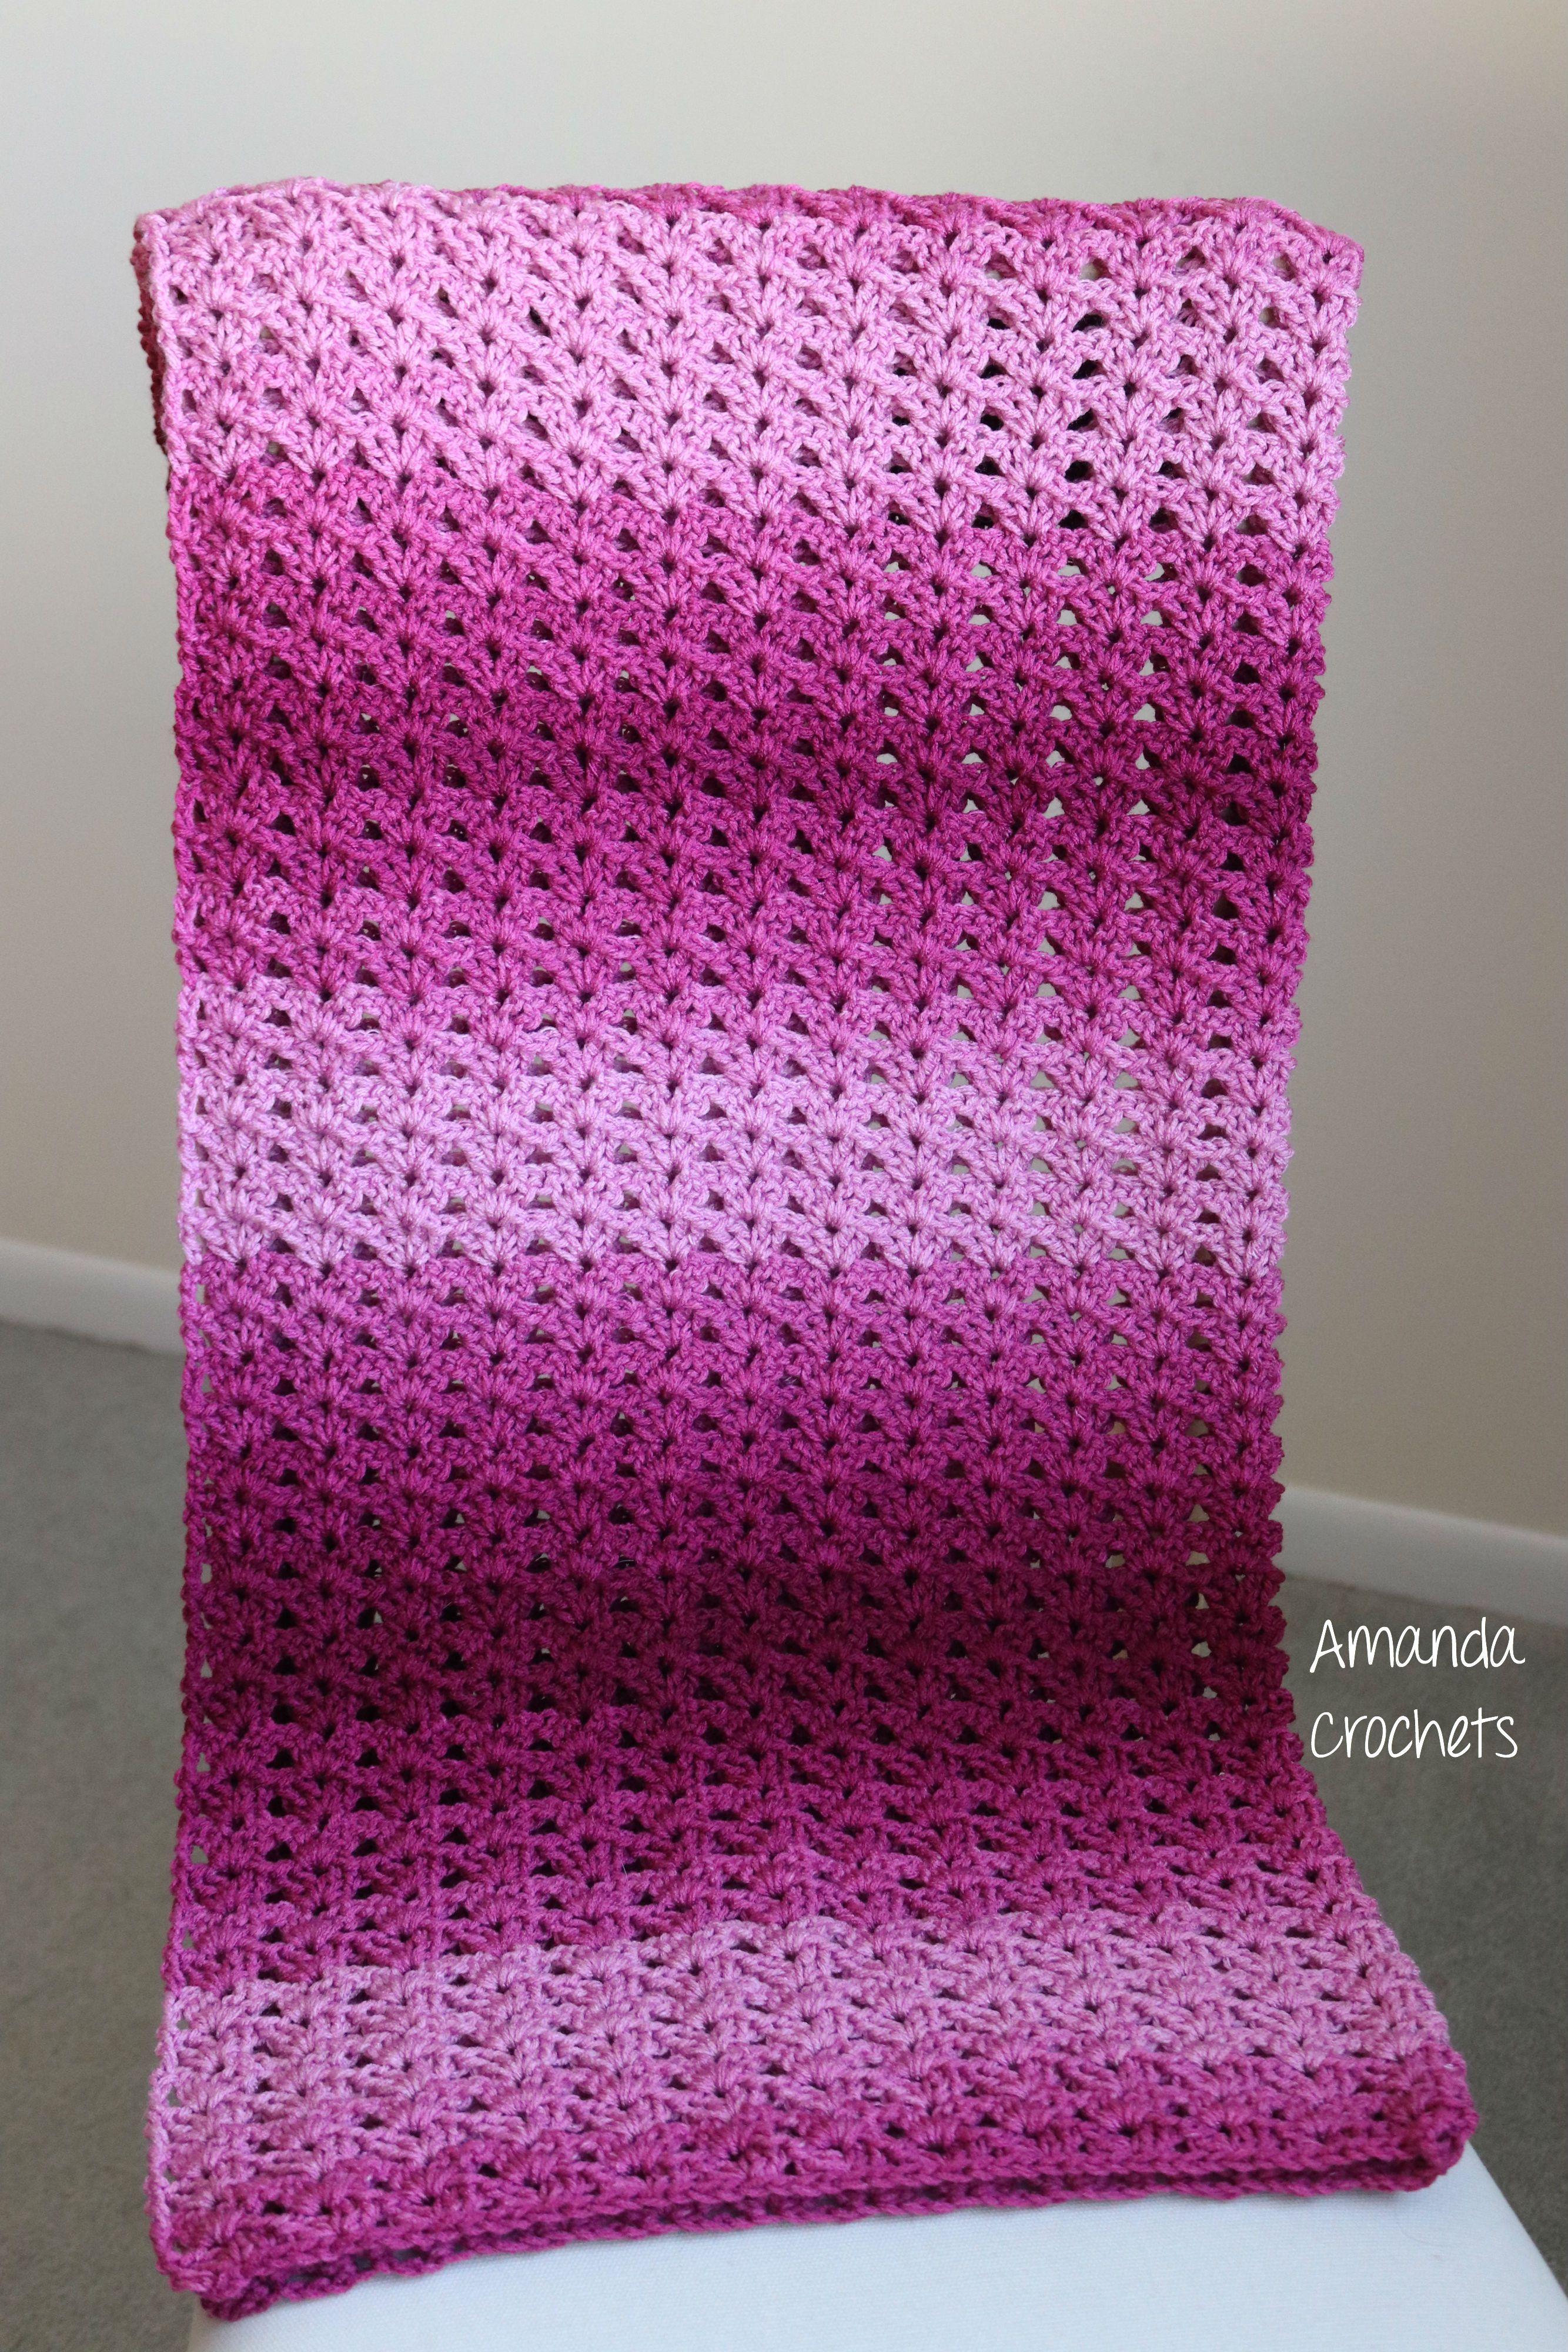 0467d0a14b Crochet Baby Blanket-Baby Blanket-Pink Baby Blanket-Red Heart Ombre-Baby  Shower Gift-Etsy Shop-Crochet Pattern